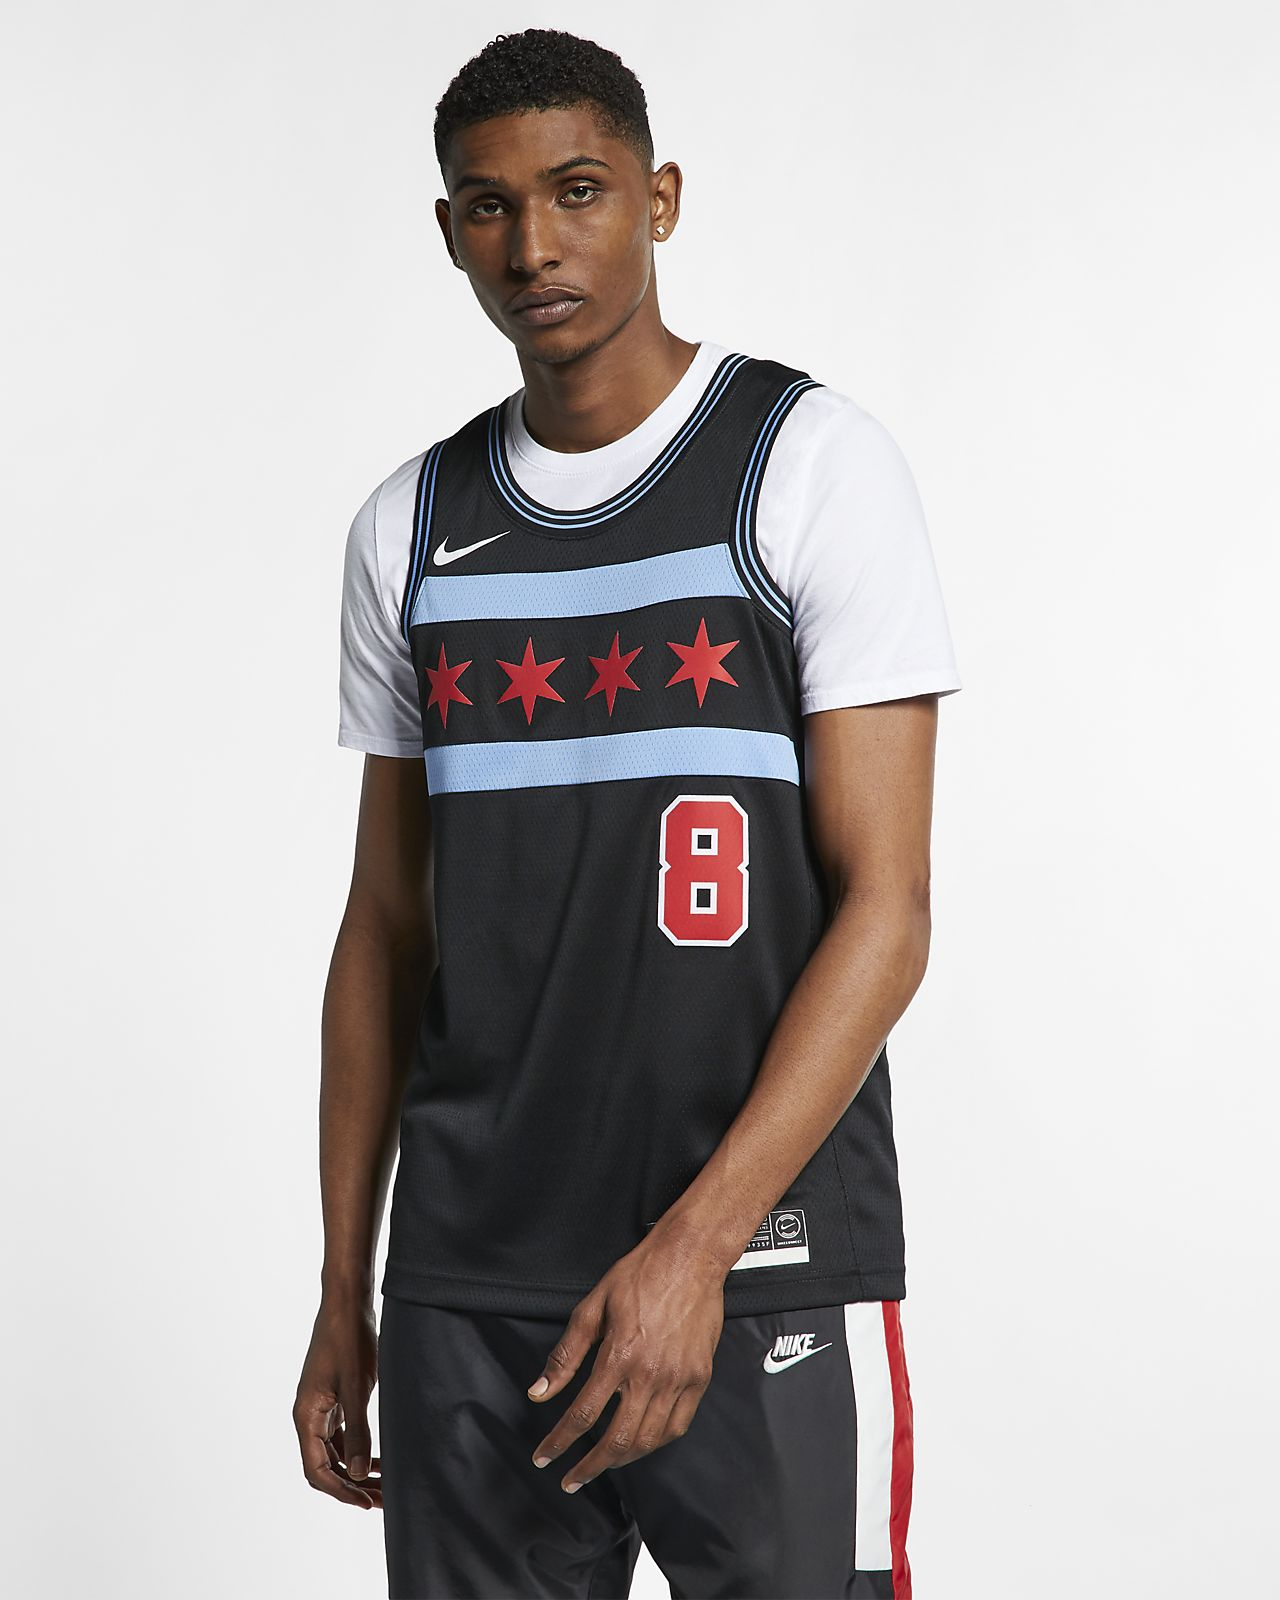 Męska koszulka Nike NBA Connected Jersey Zach LaVine City Edition Swingman (Chicago Bulls)